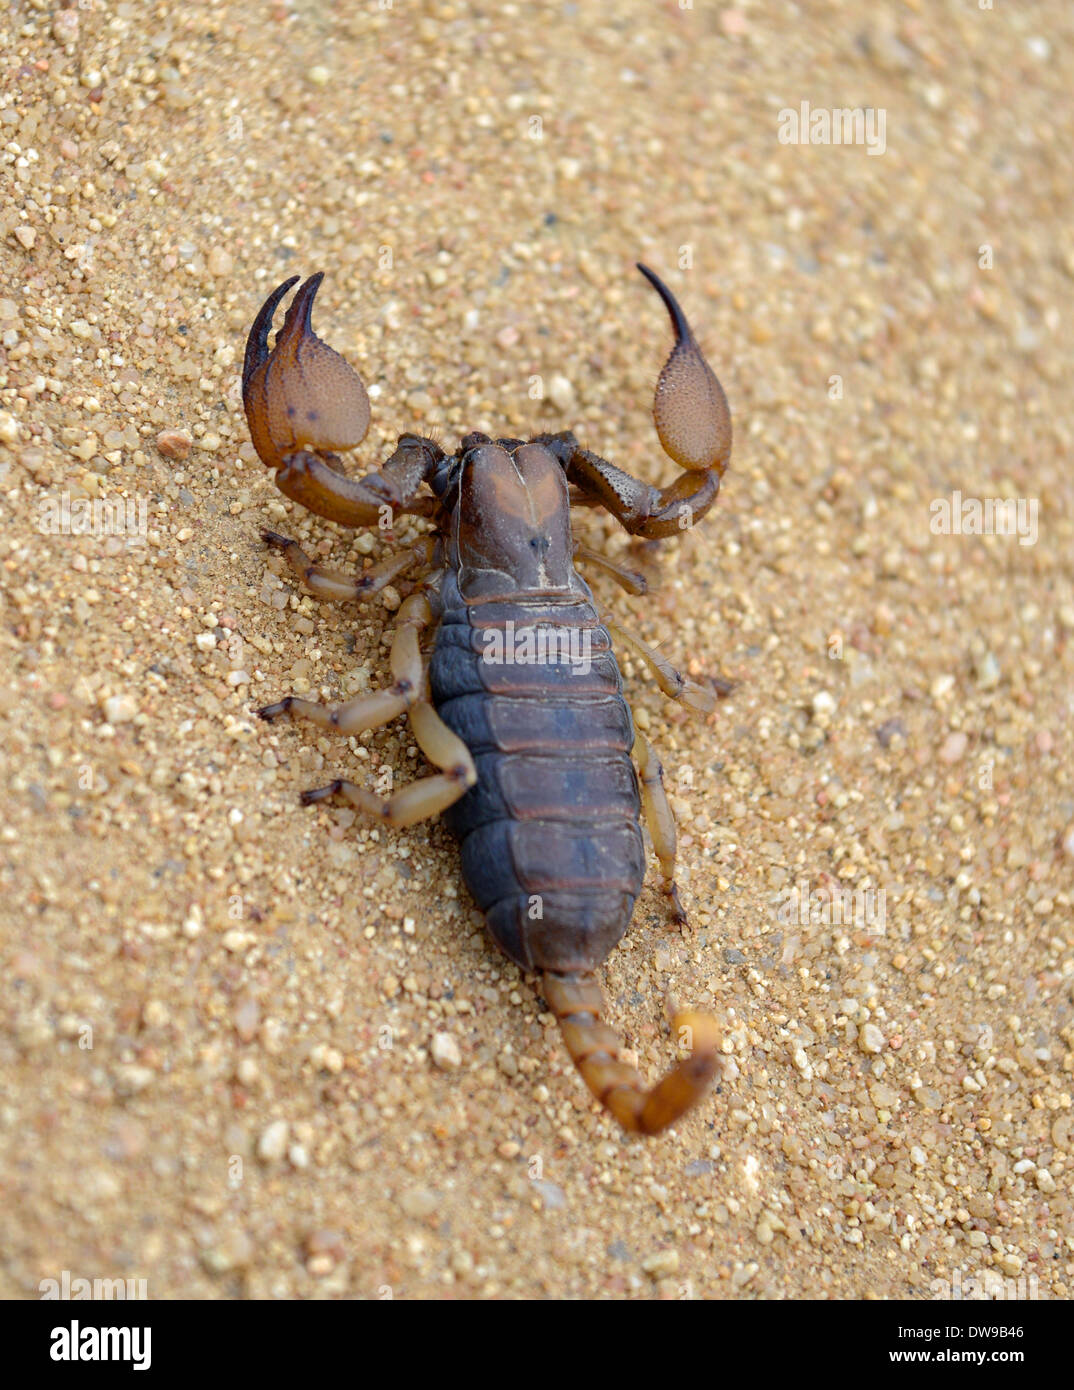 South African Scorpion Stockfotos & South African Scorpion Bilder ...